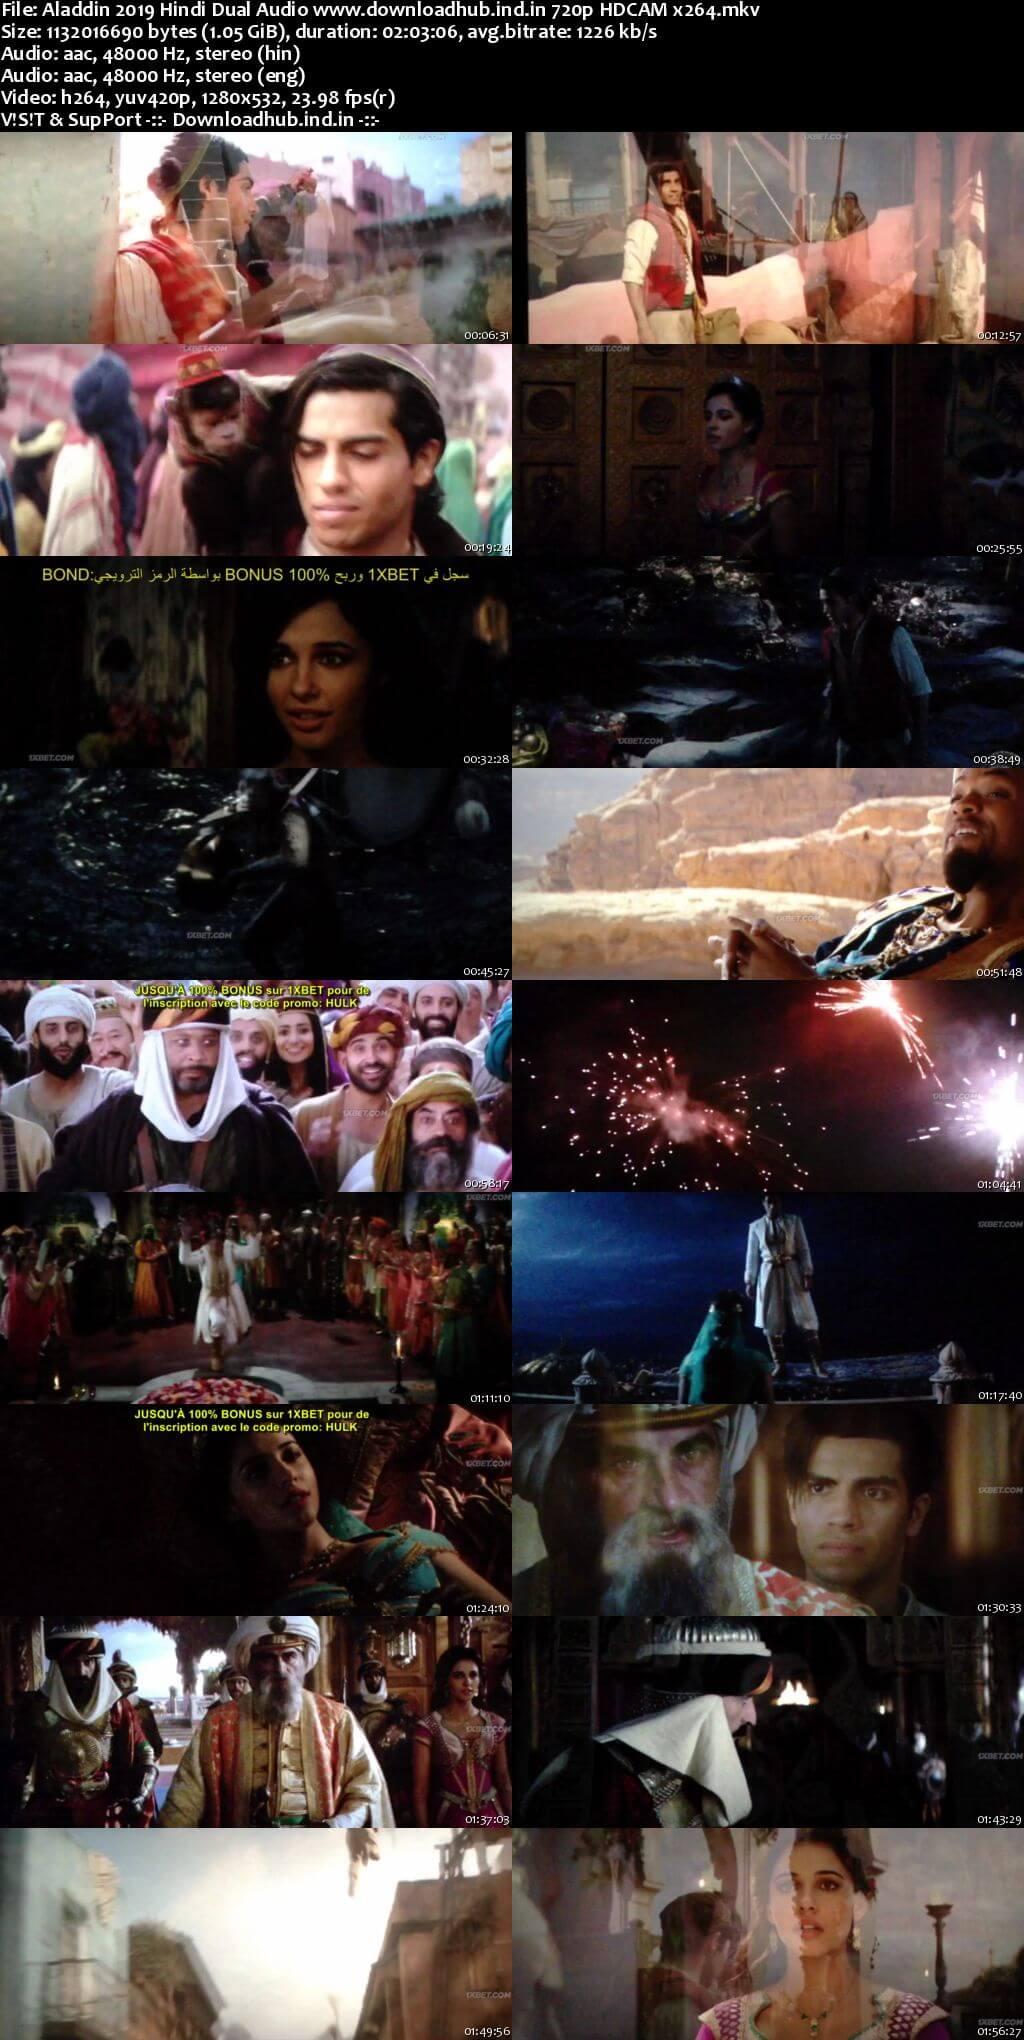 Aladdin 2019 Hindi Dual Audio 720p HDCAM x264